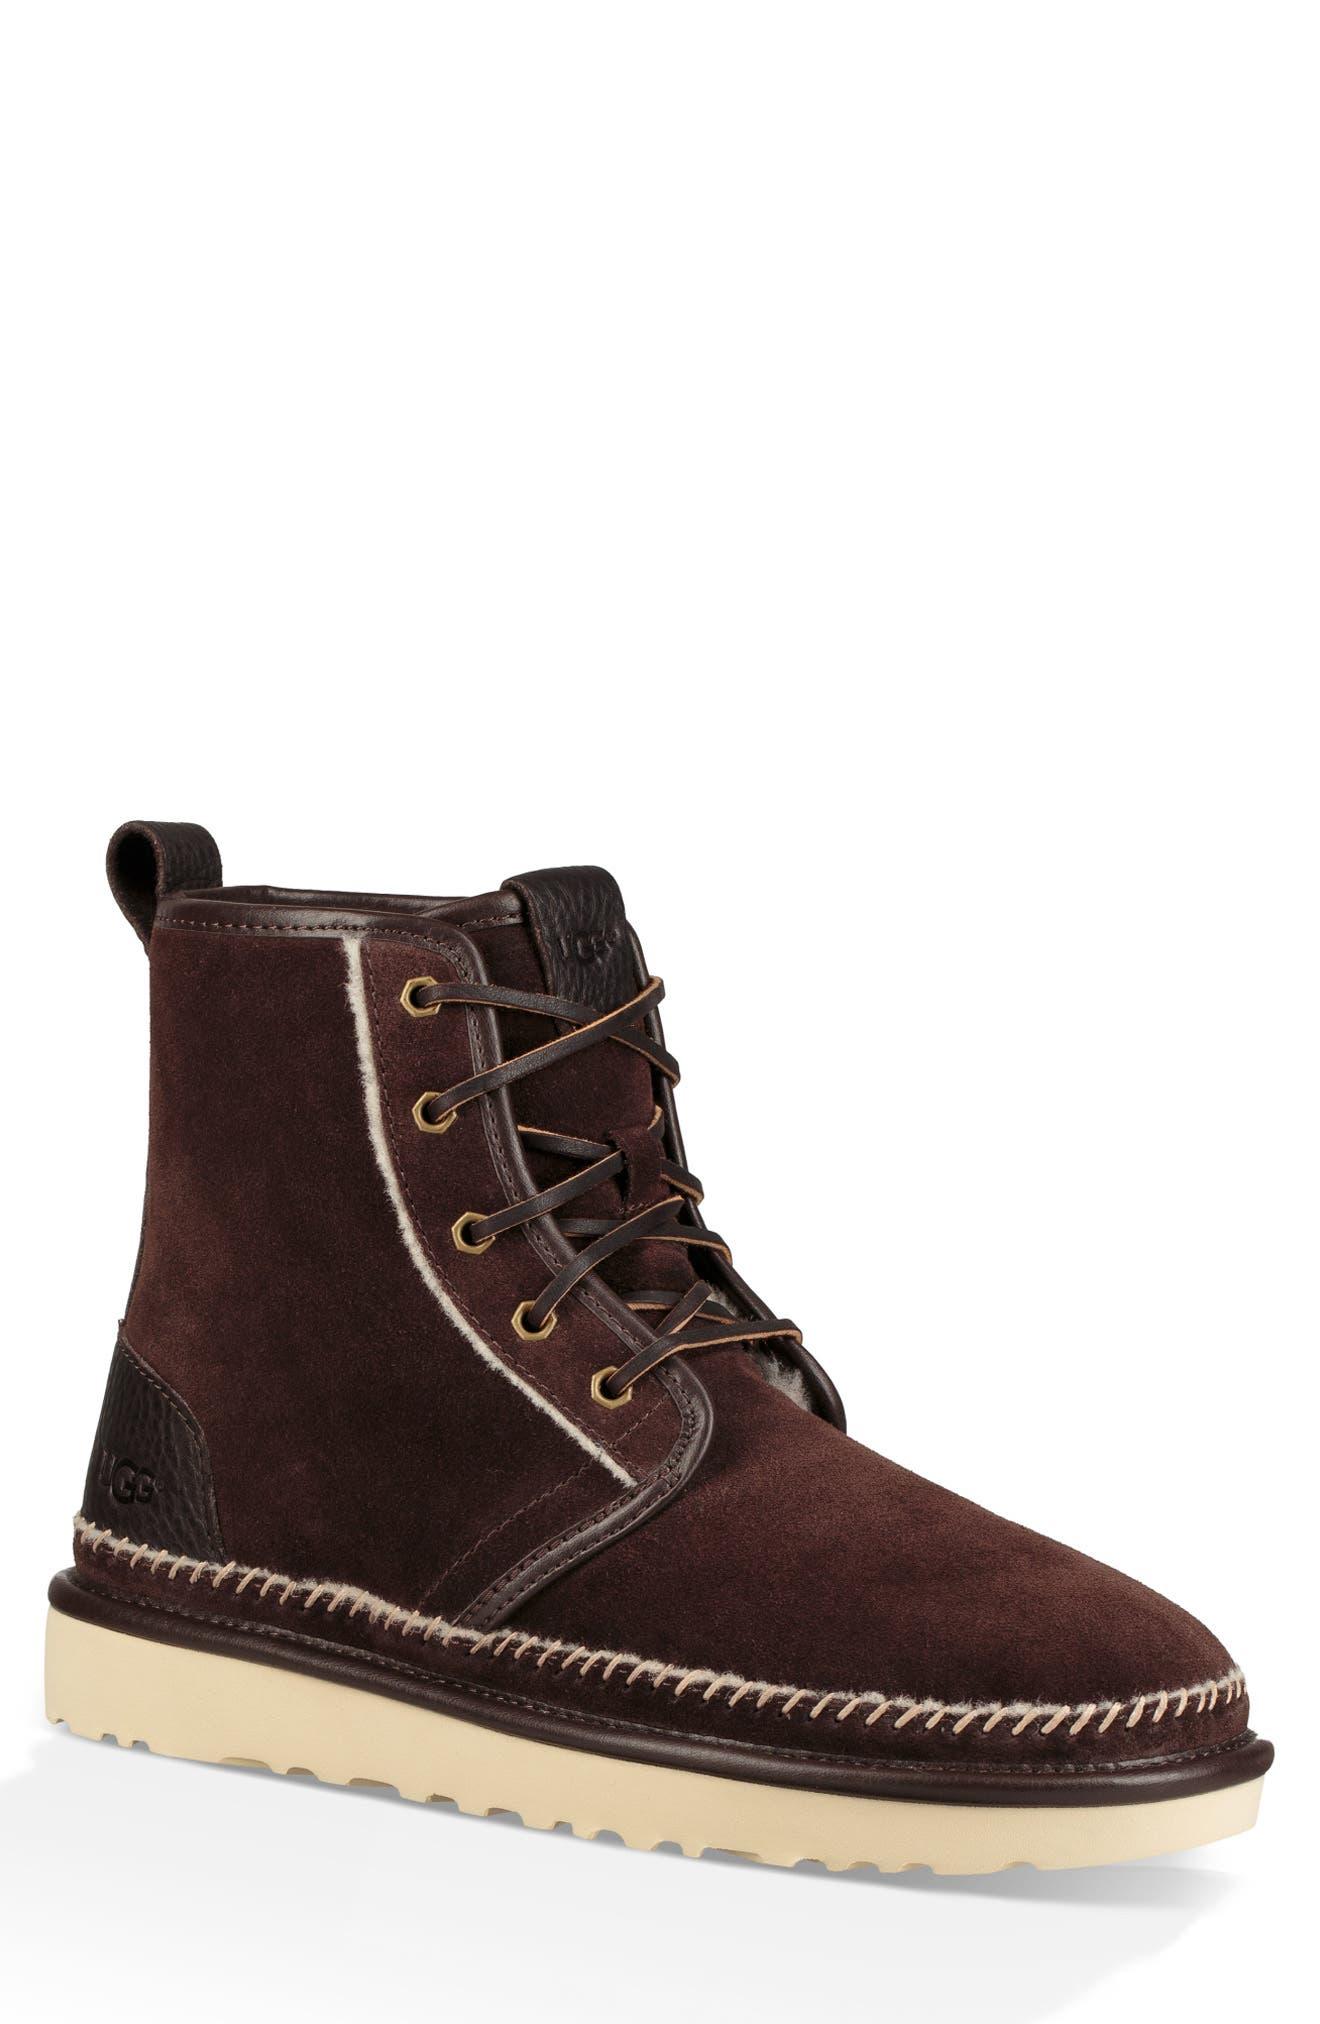 Ugg Harkley Stitch Plain Toe Boot, Brown